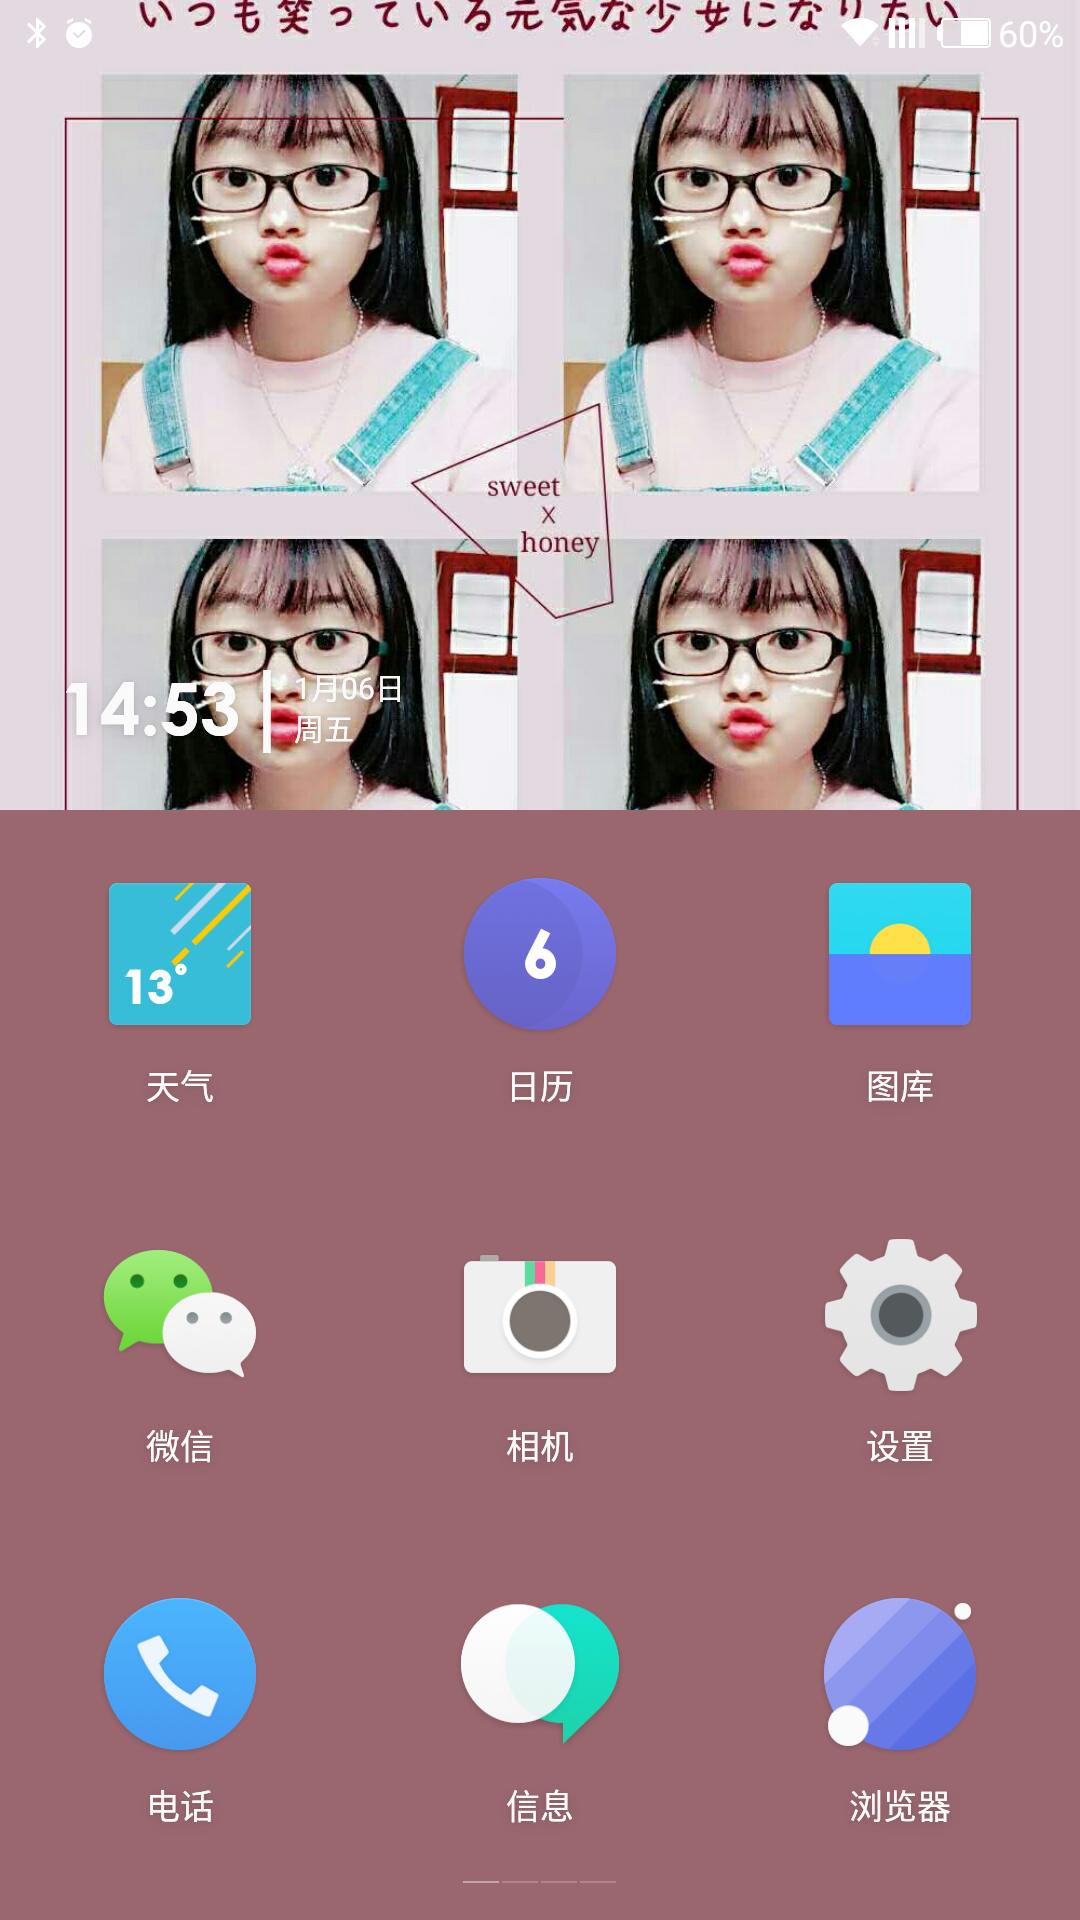 Screenshot_20170106-145359.png